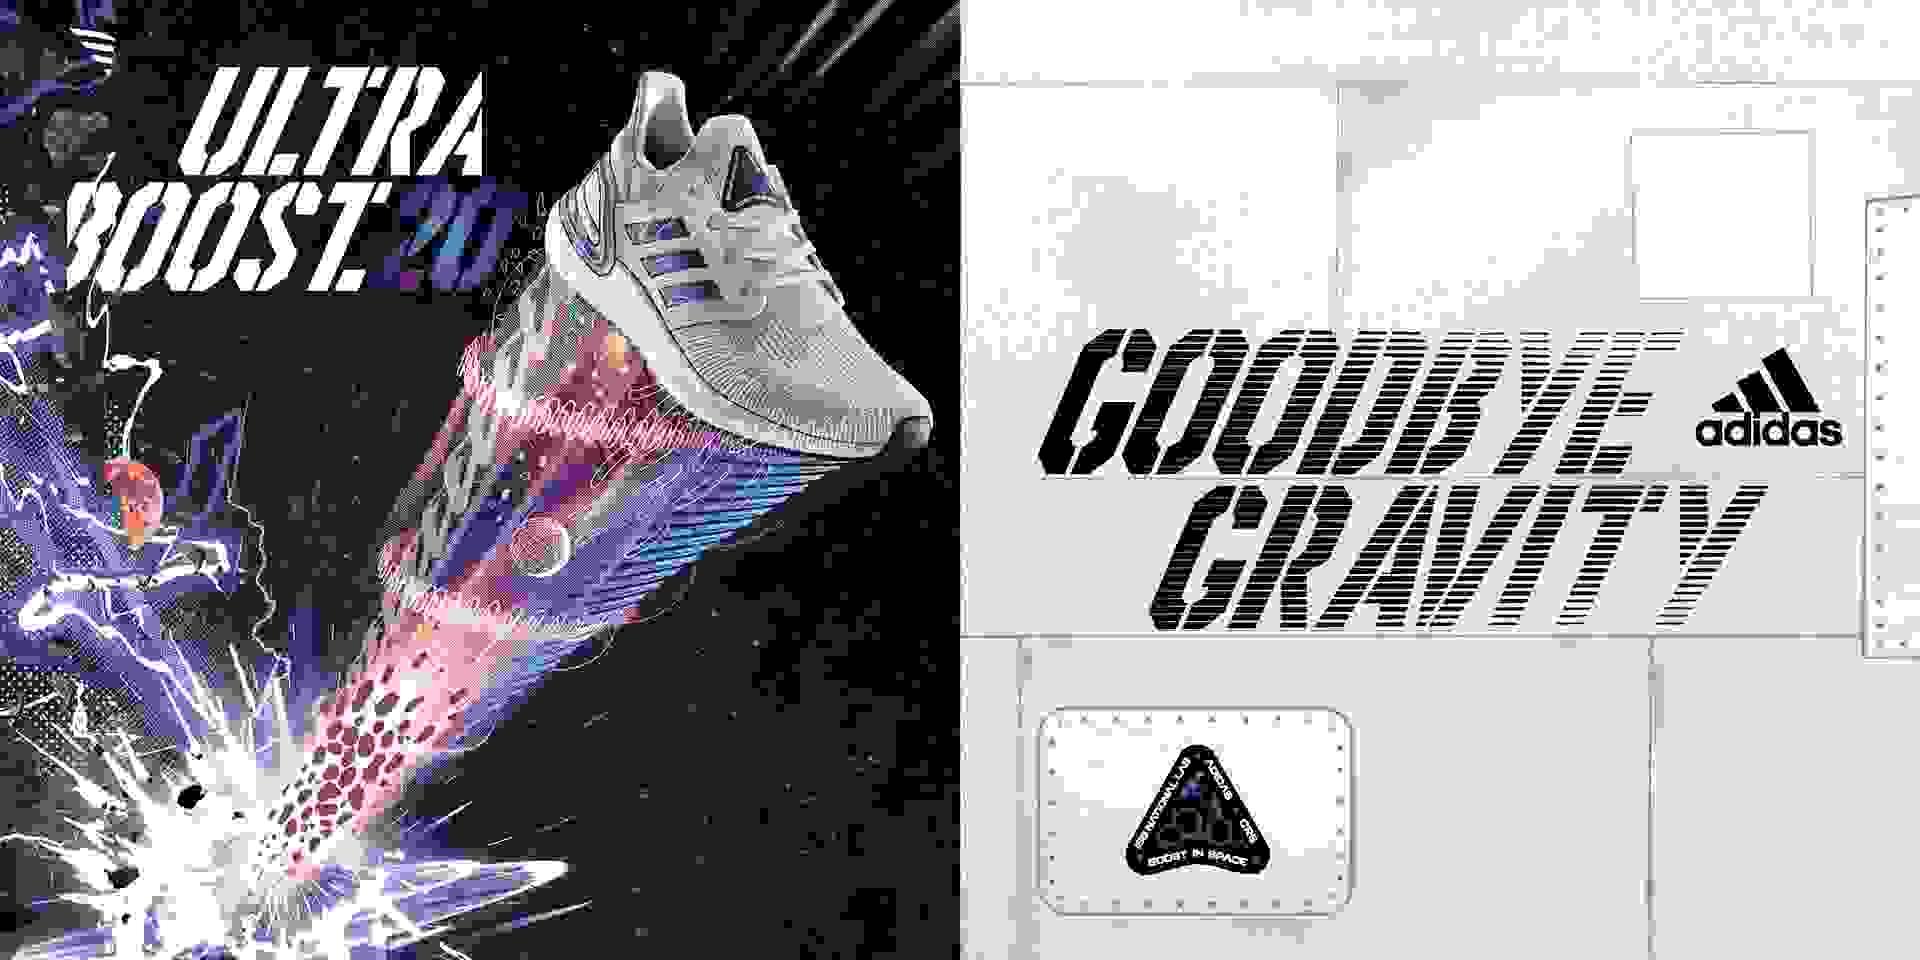 zur Adidas Ultraboost20 Kollektion